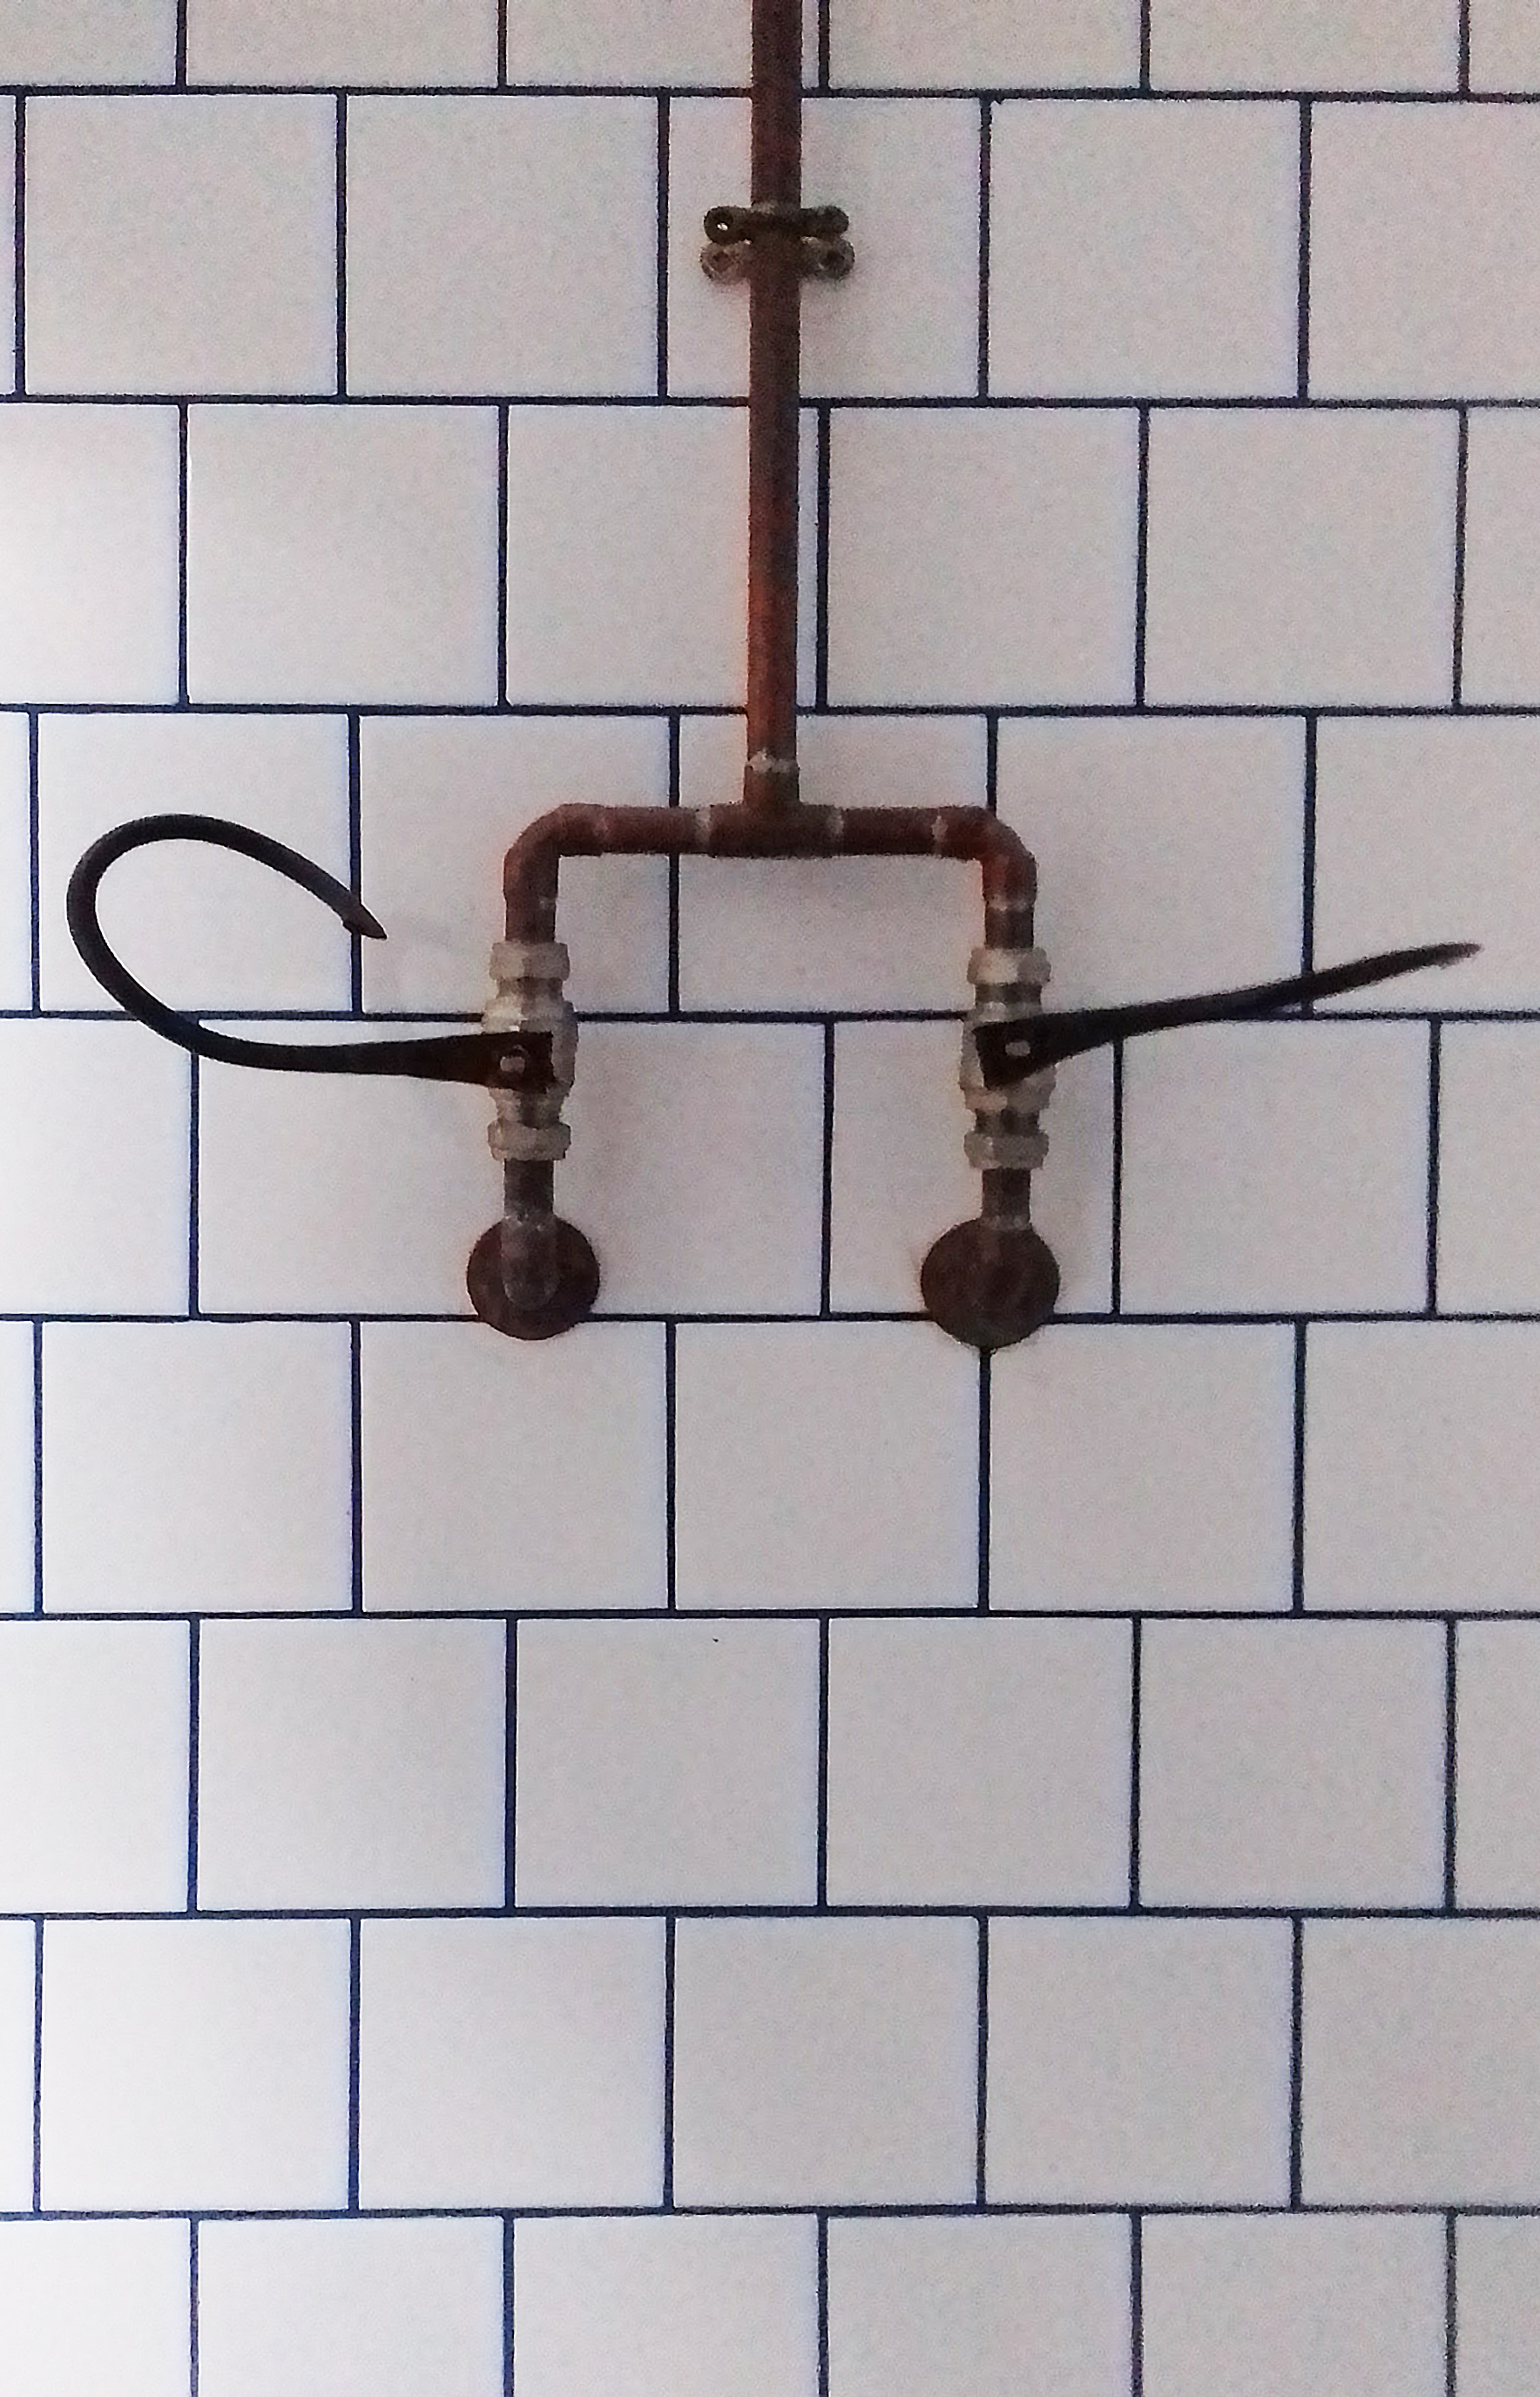 shower taps.jpg